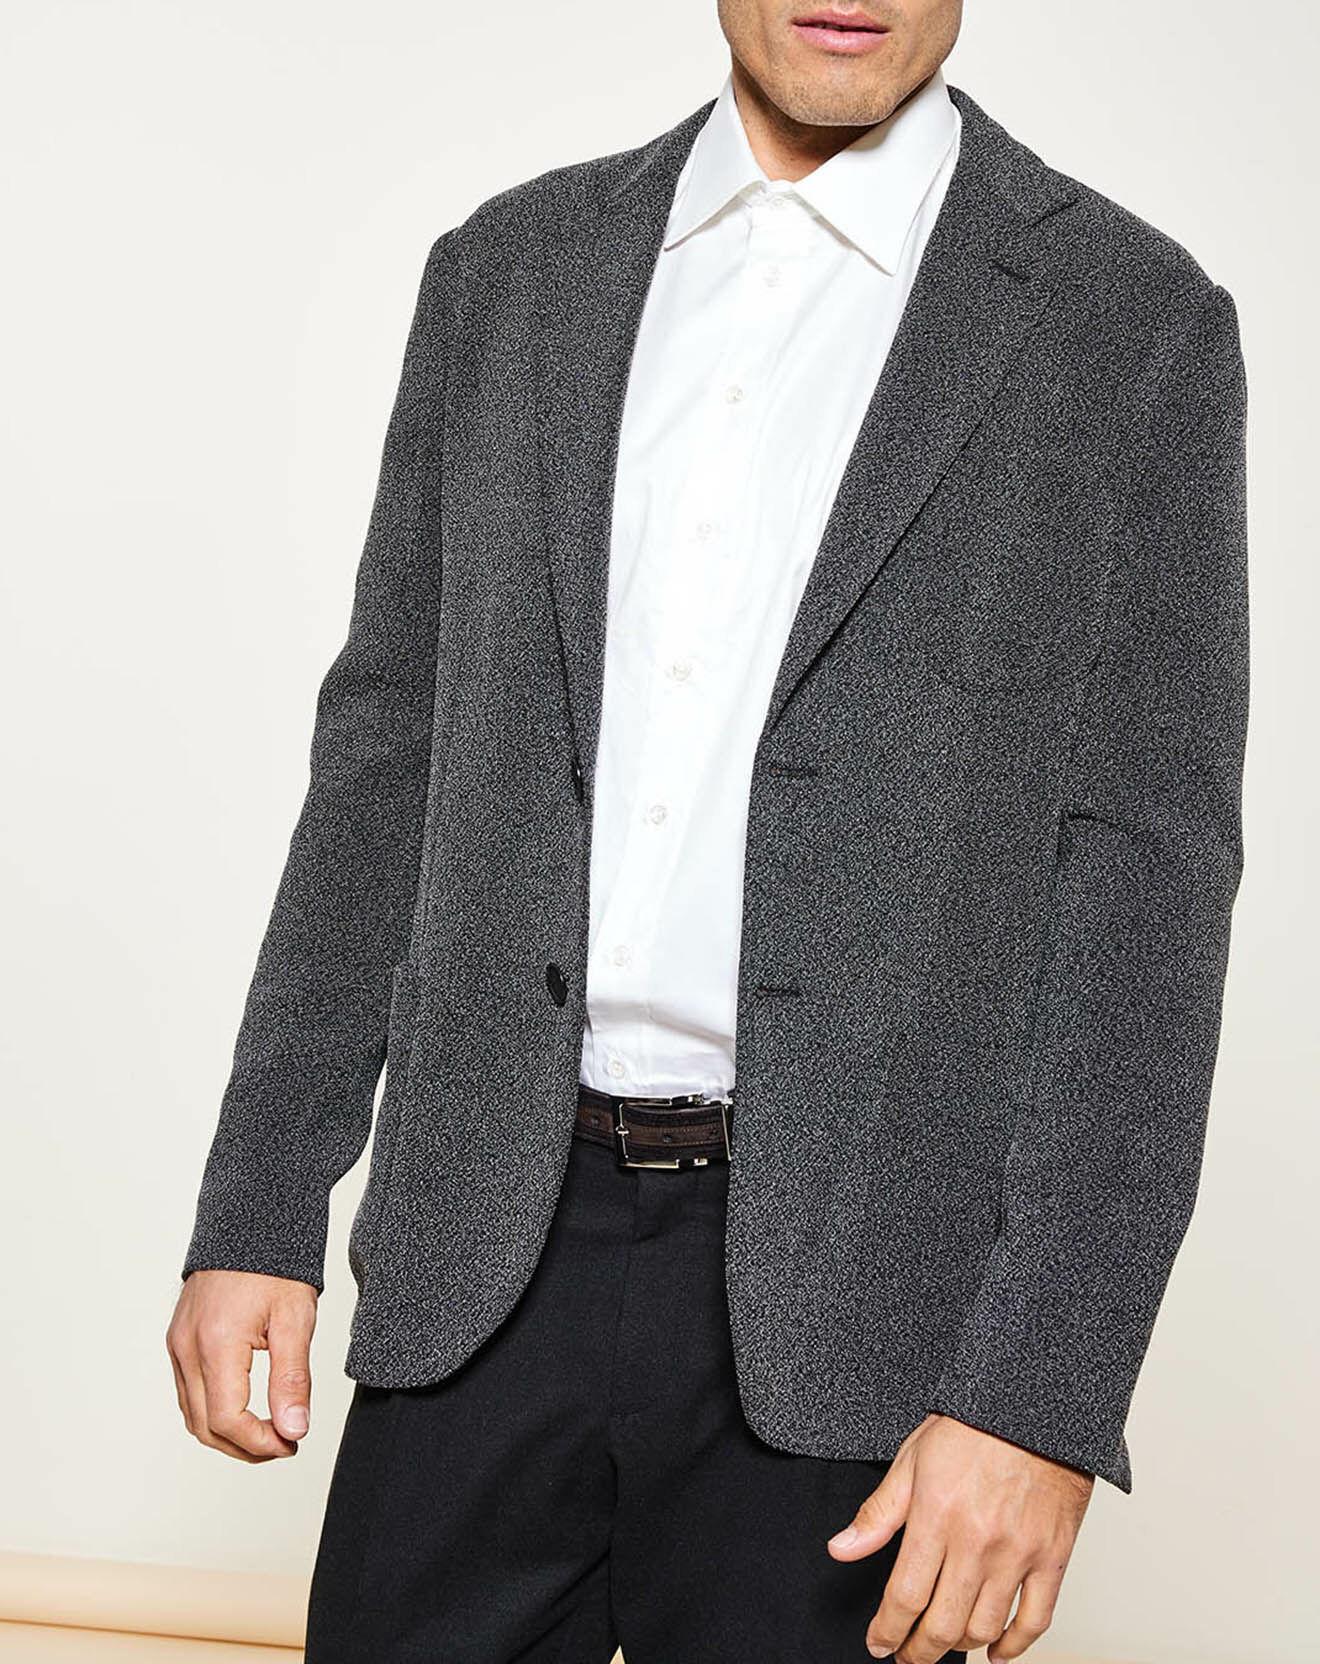 Veste de costume ajustée - Giorgio Armani - Modalova